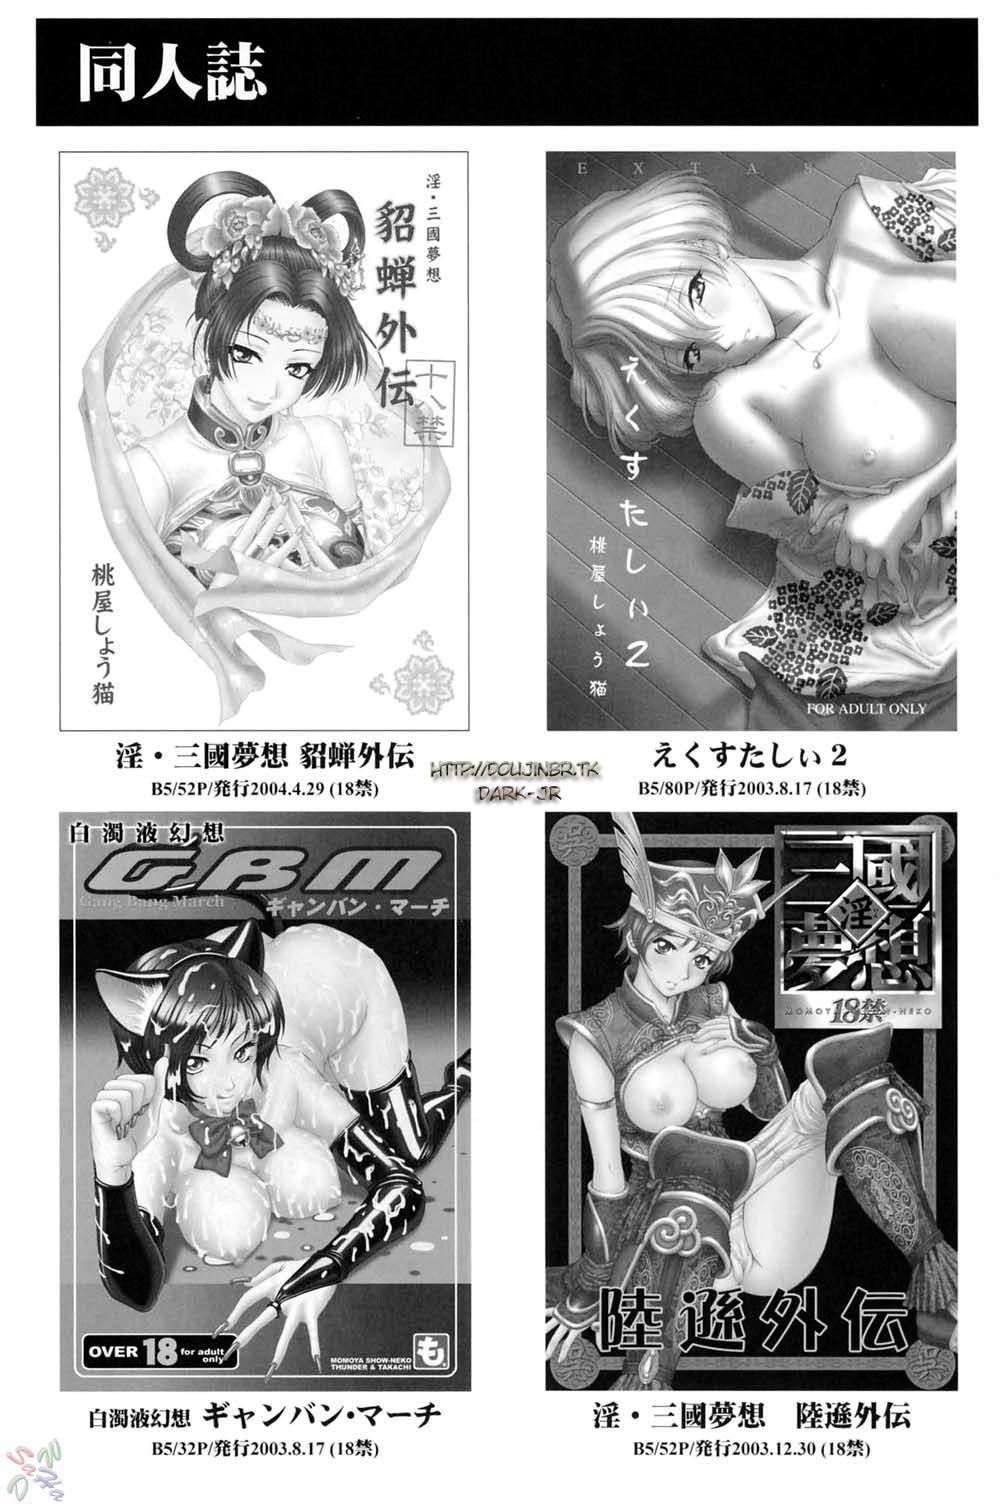 Hentaihome-Bleach-Orihime-chan-de-Go-25